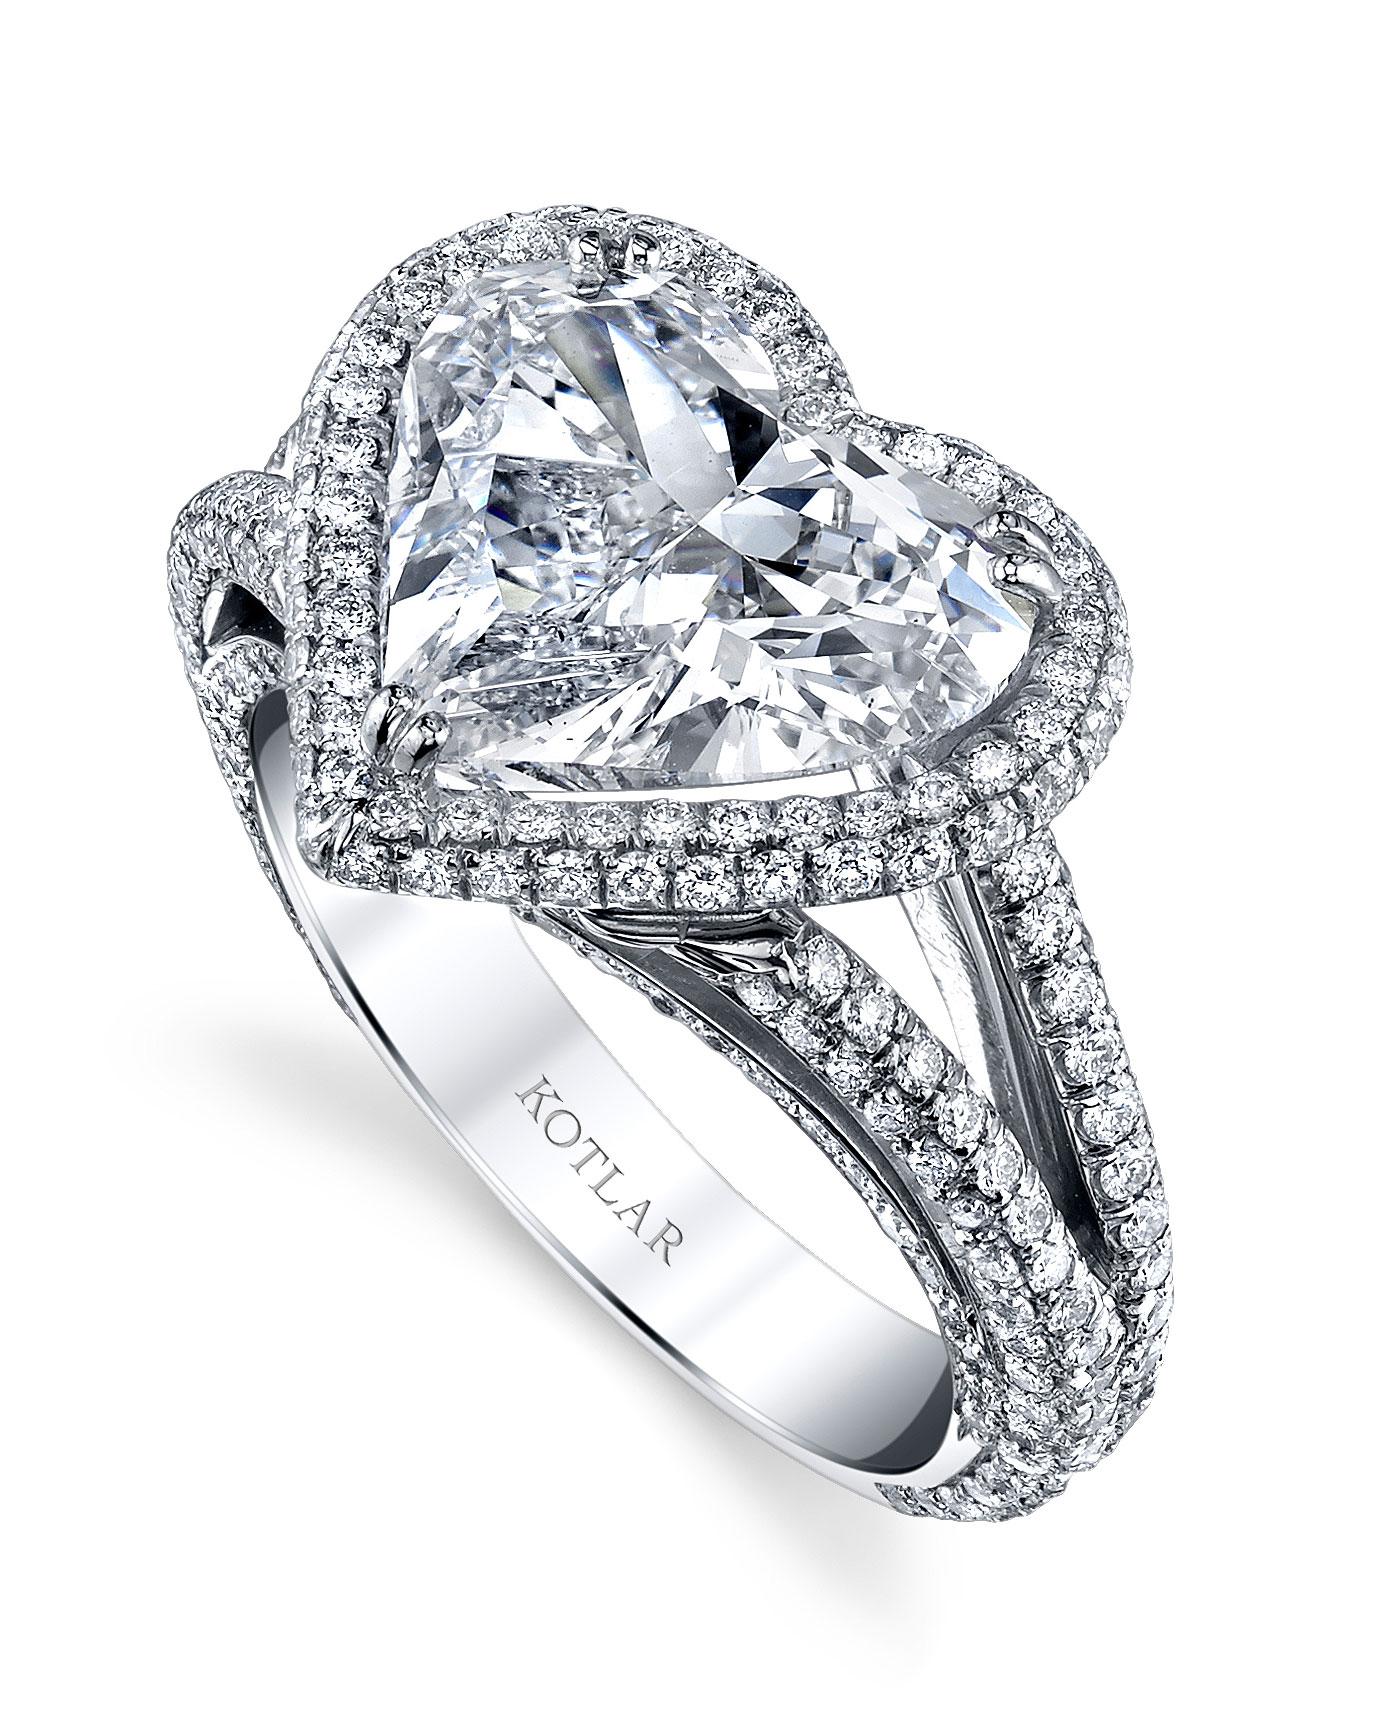 celebrity-rings-harry-kotlar-lady-gaga-0316.jpg